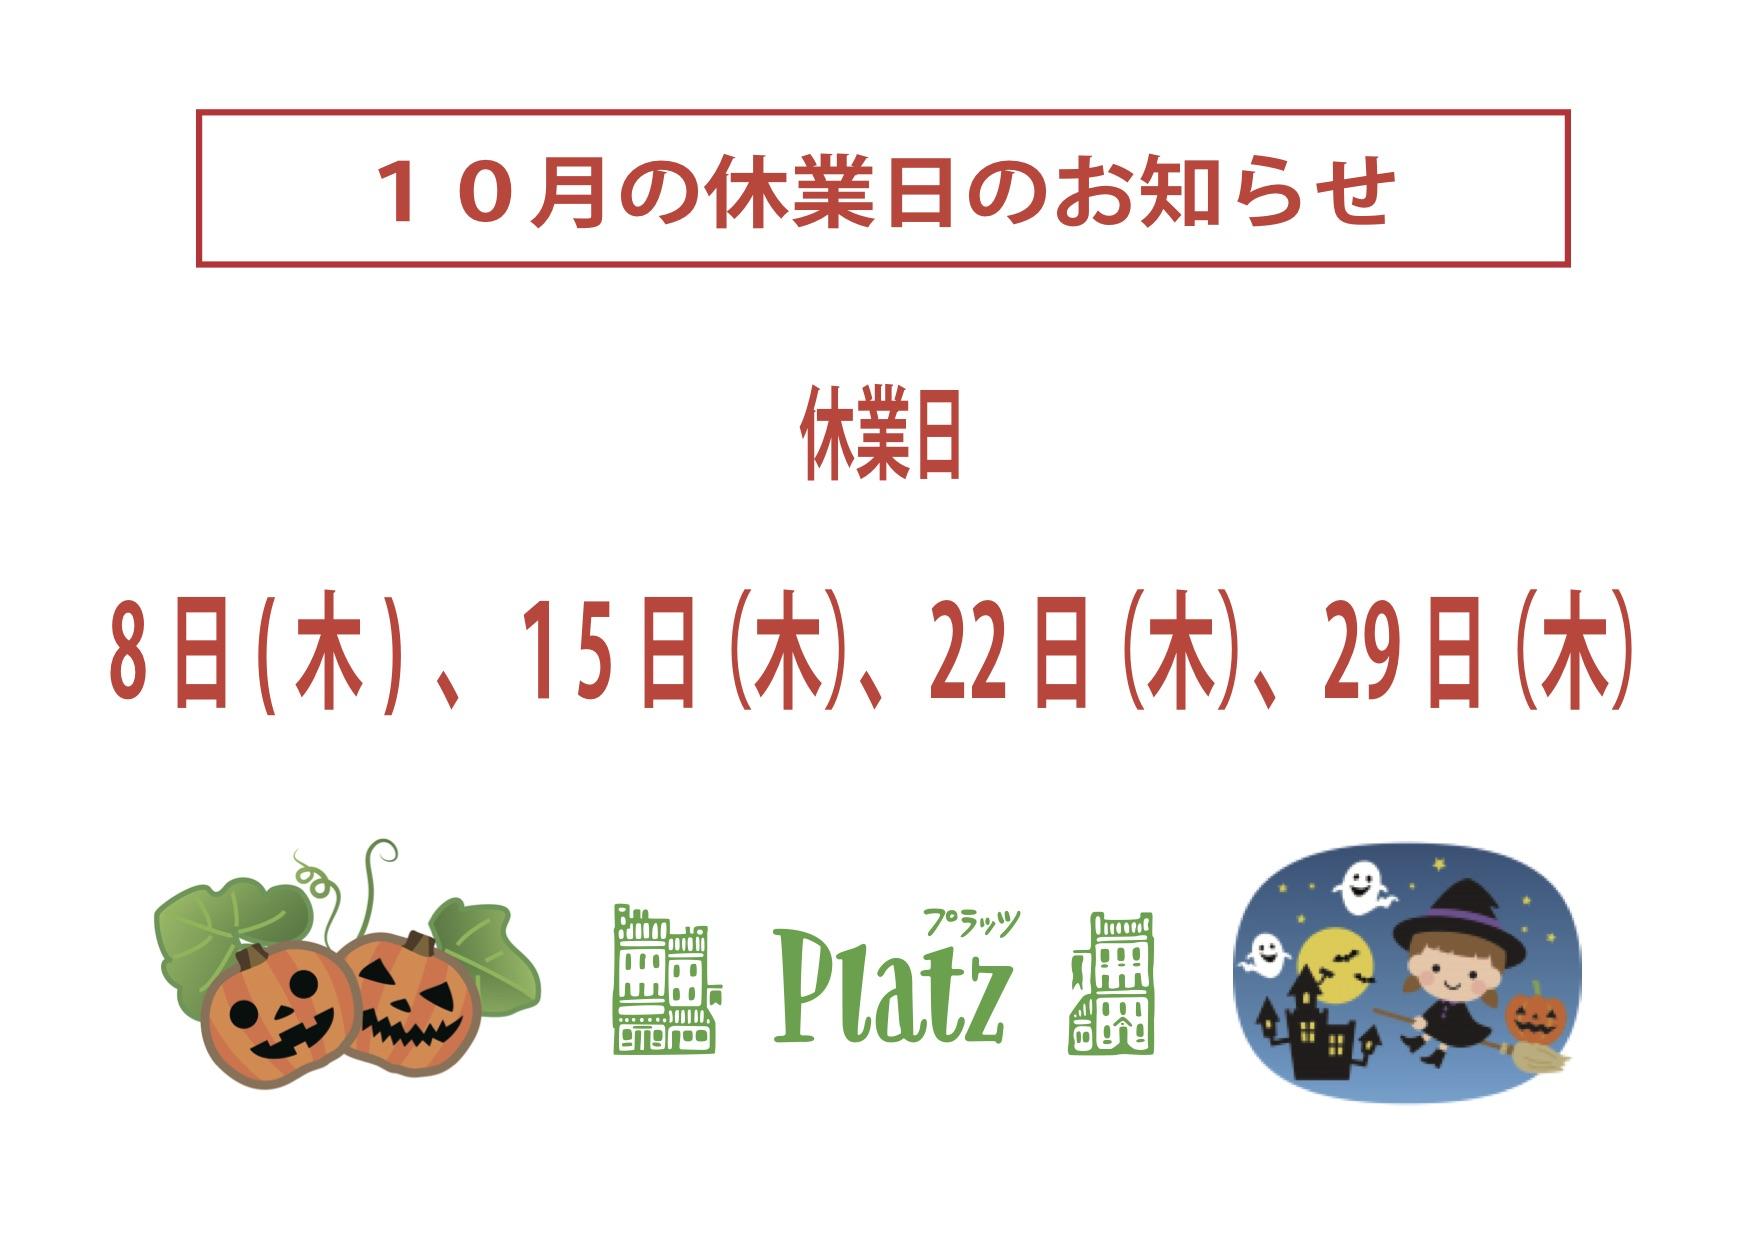 http://www.kyoto-platz.jp/news/images/2020.10%E6%9C%88%E4%BC%91%E6%A5%AD%E6%97%A5%E3%81%AE%E3%82%B3%E3%83%94%E3%83%BC.jpg